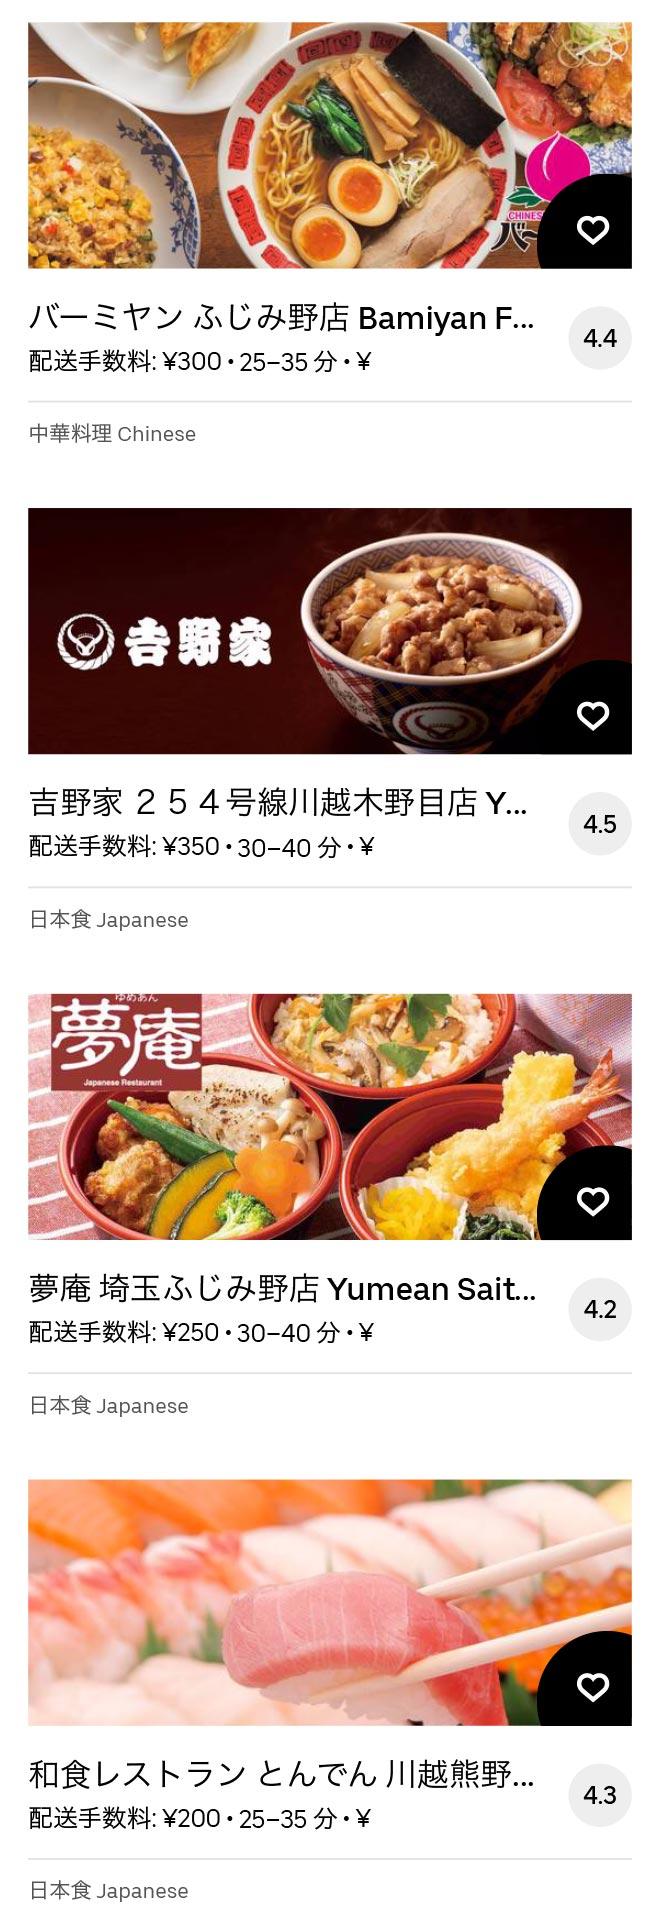 Kamifukuoka menu 2011 11